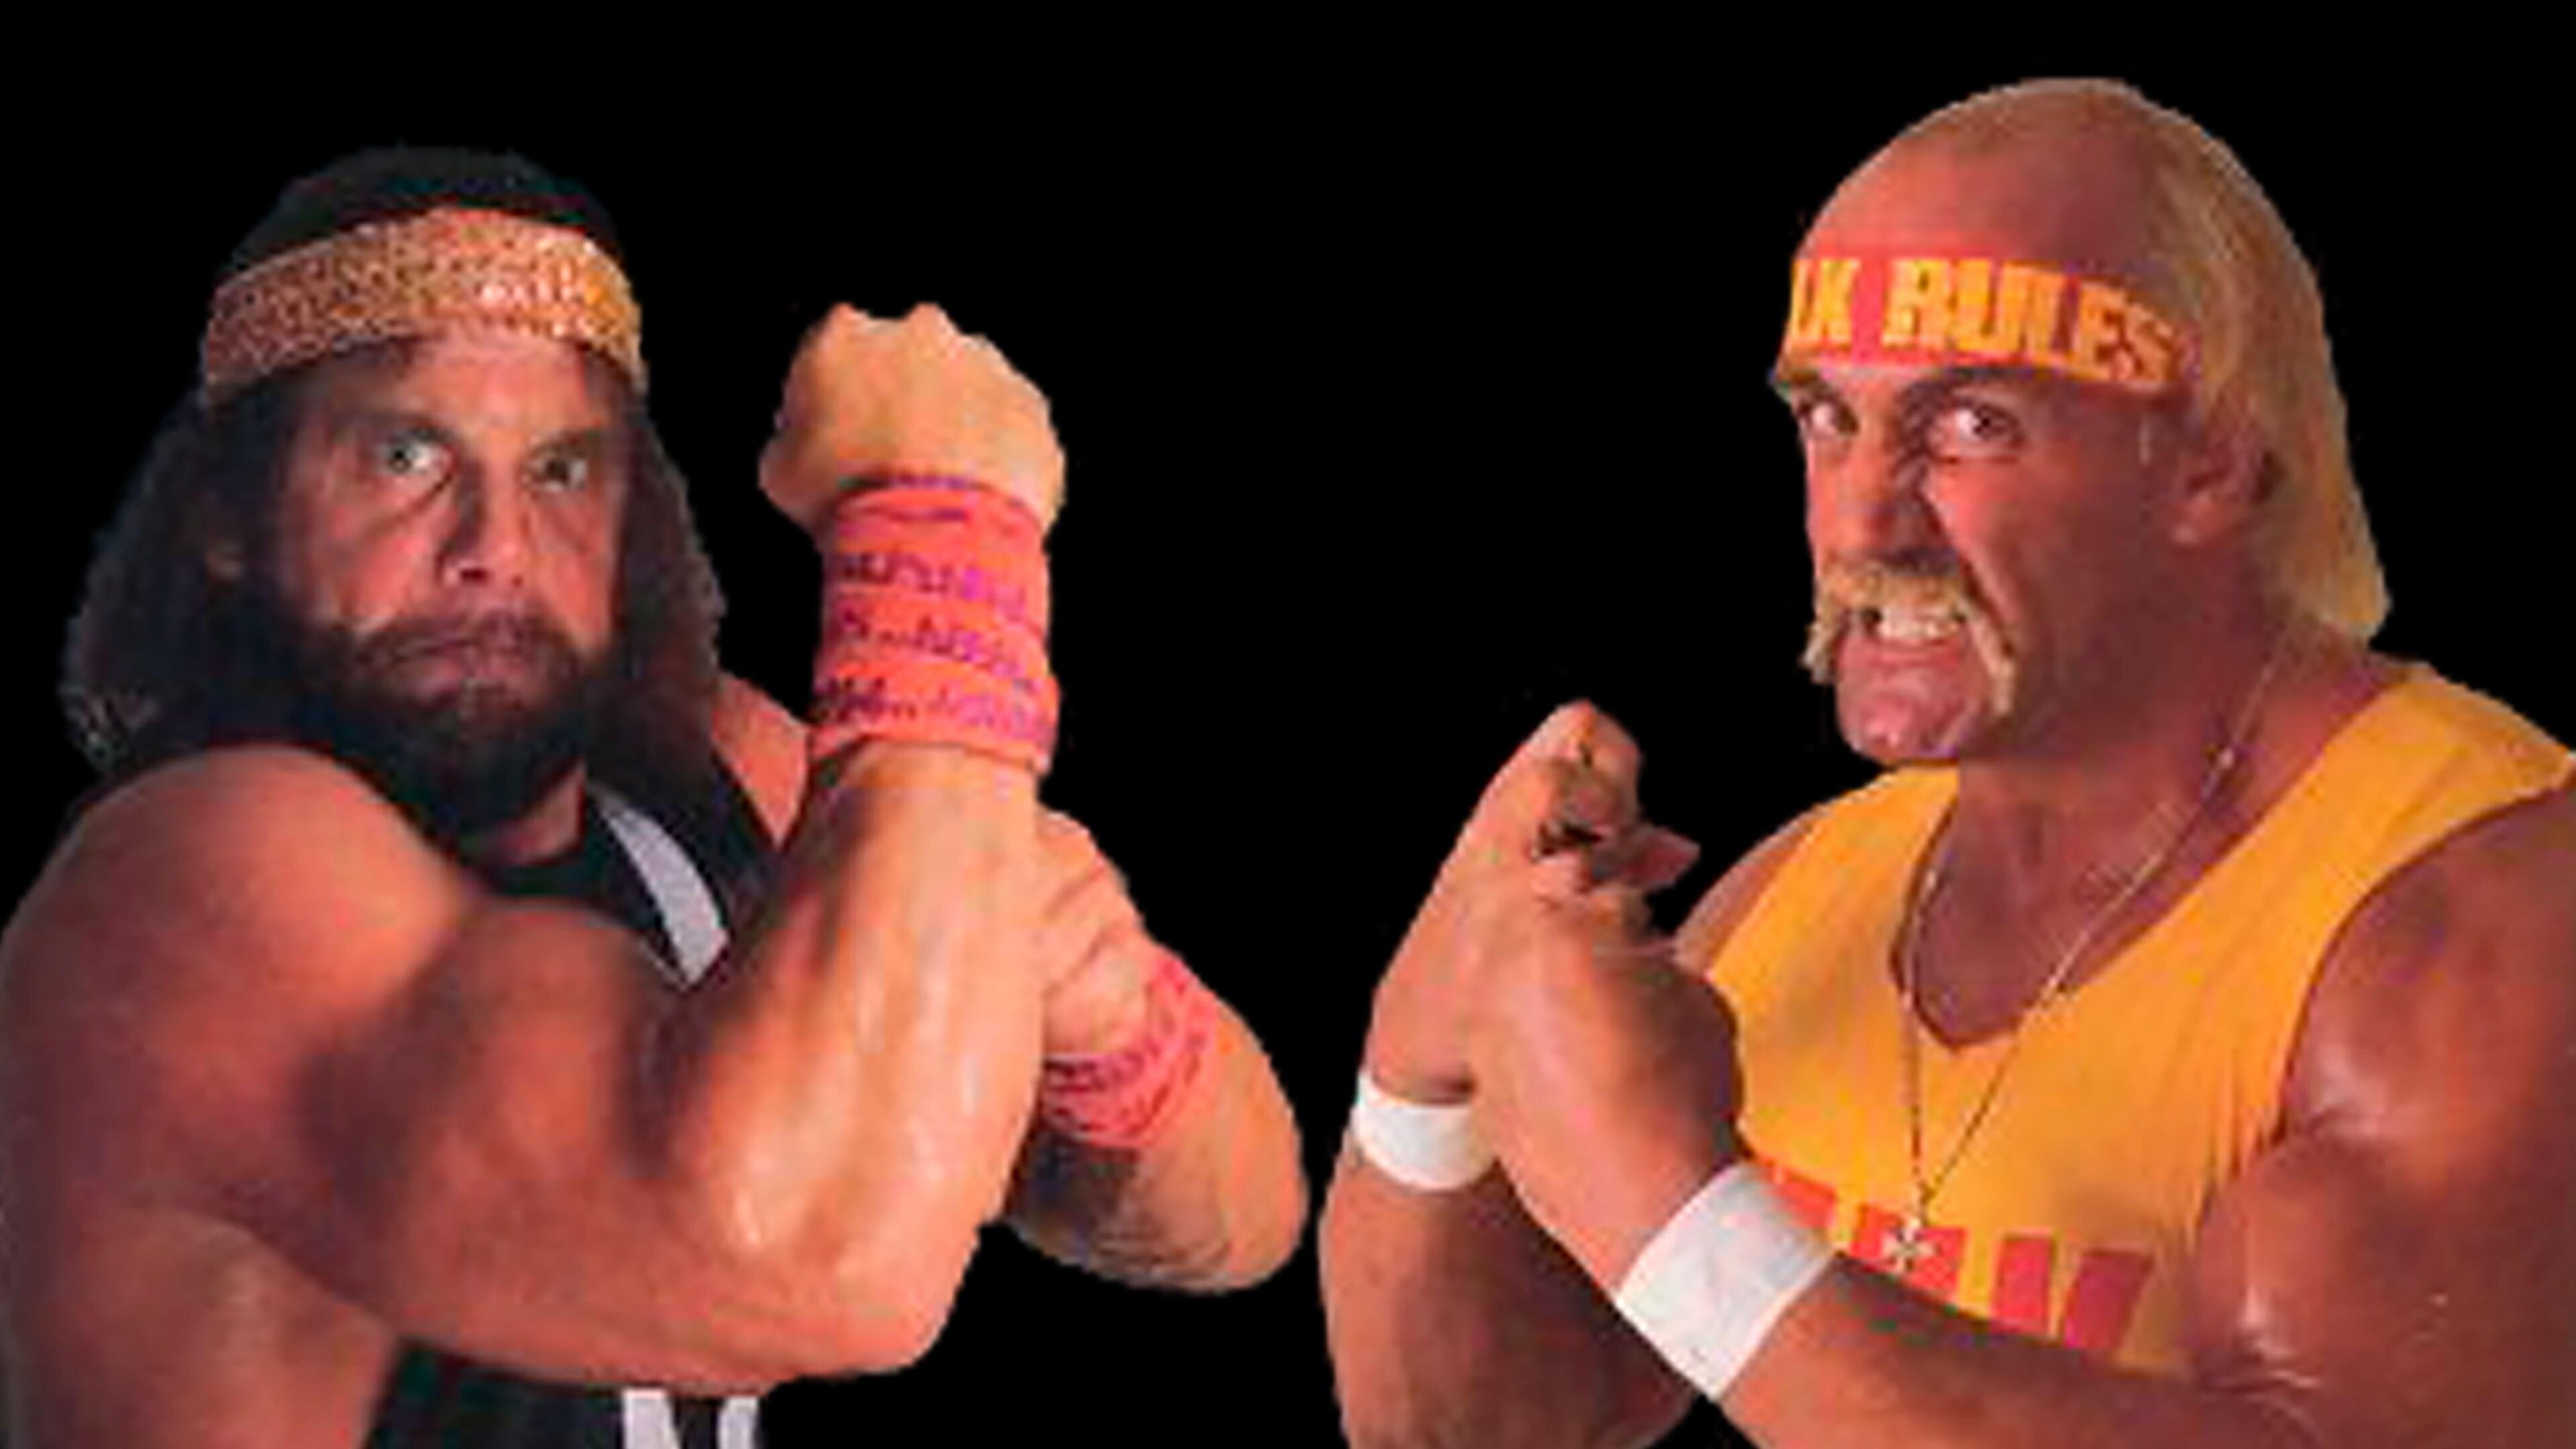 WrestleMania 5